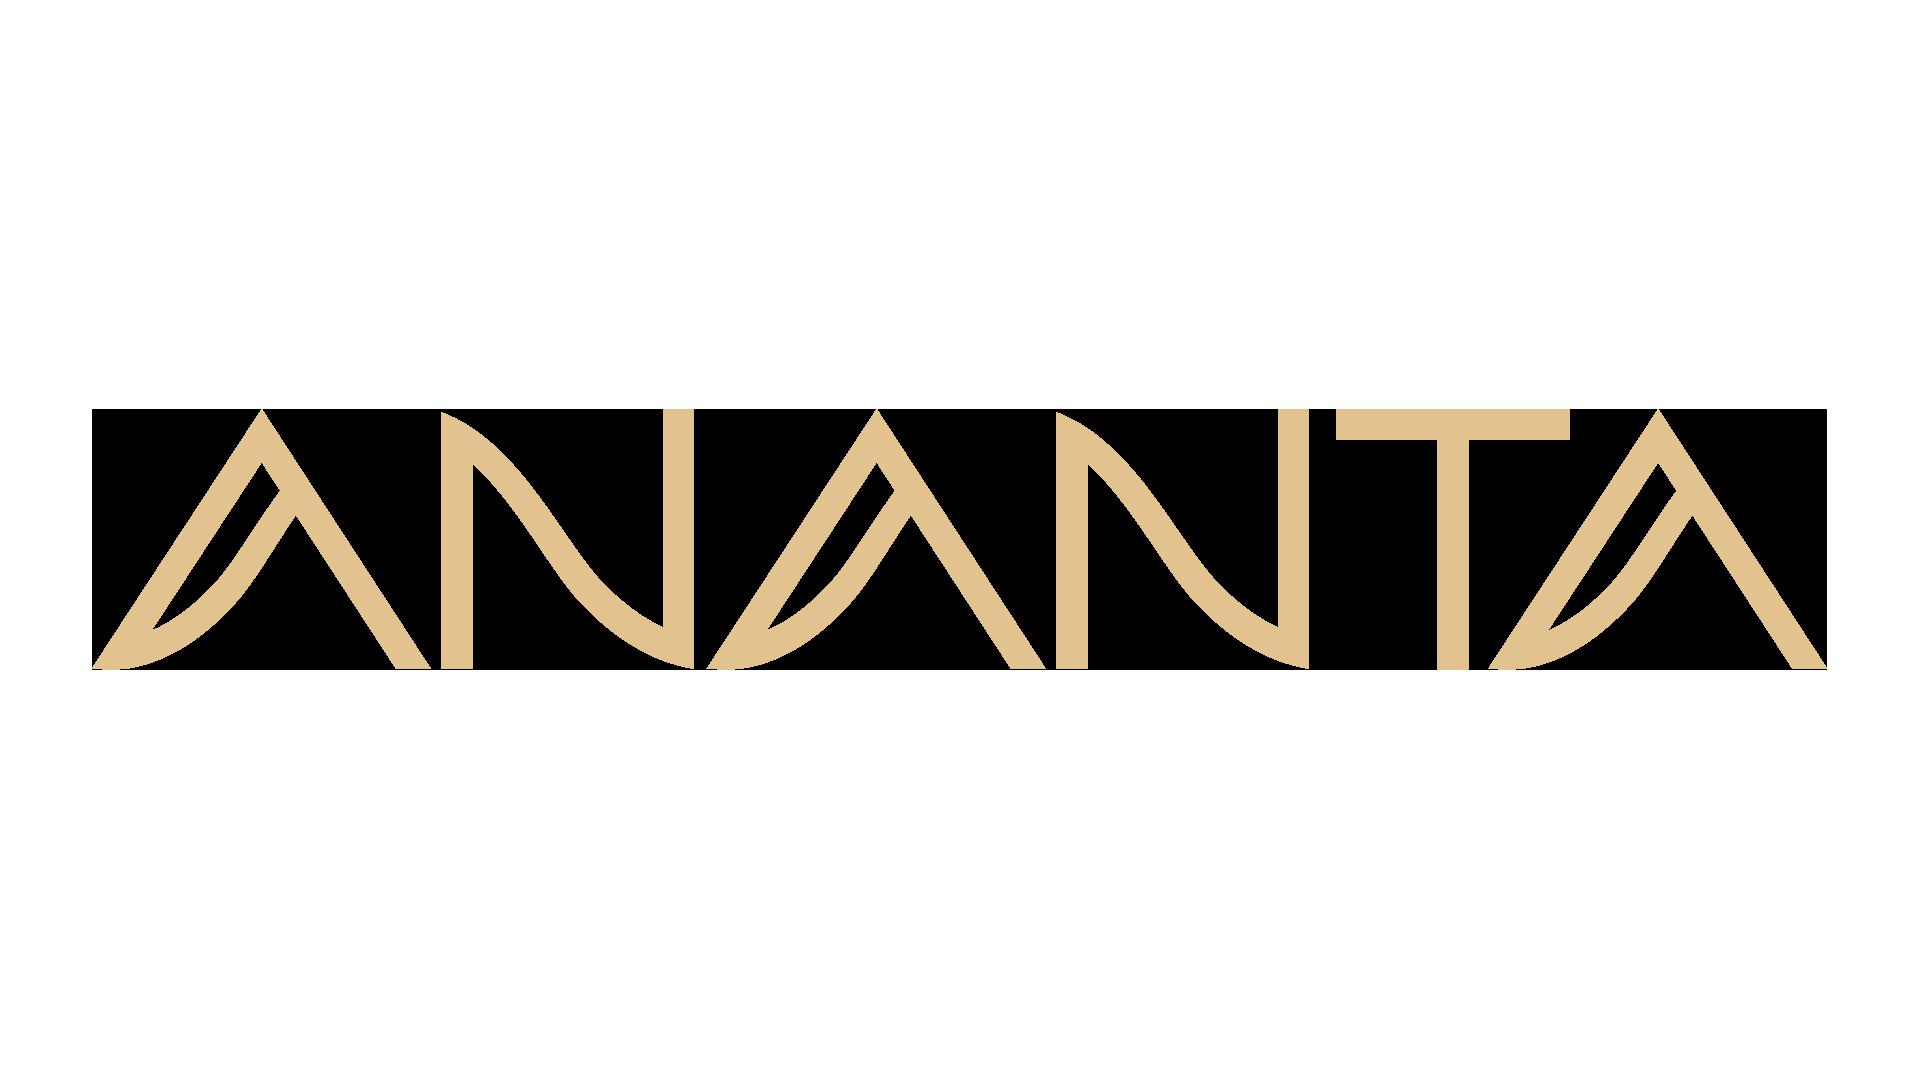 The Ananta